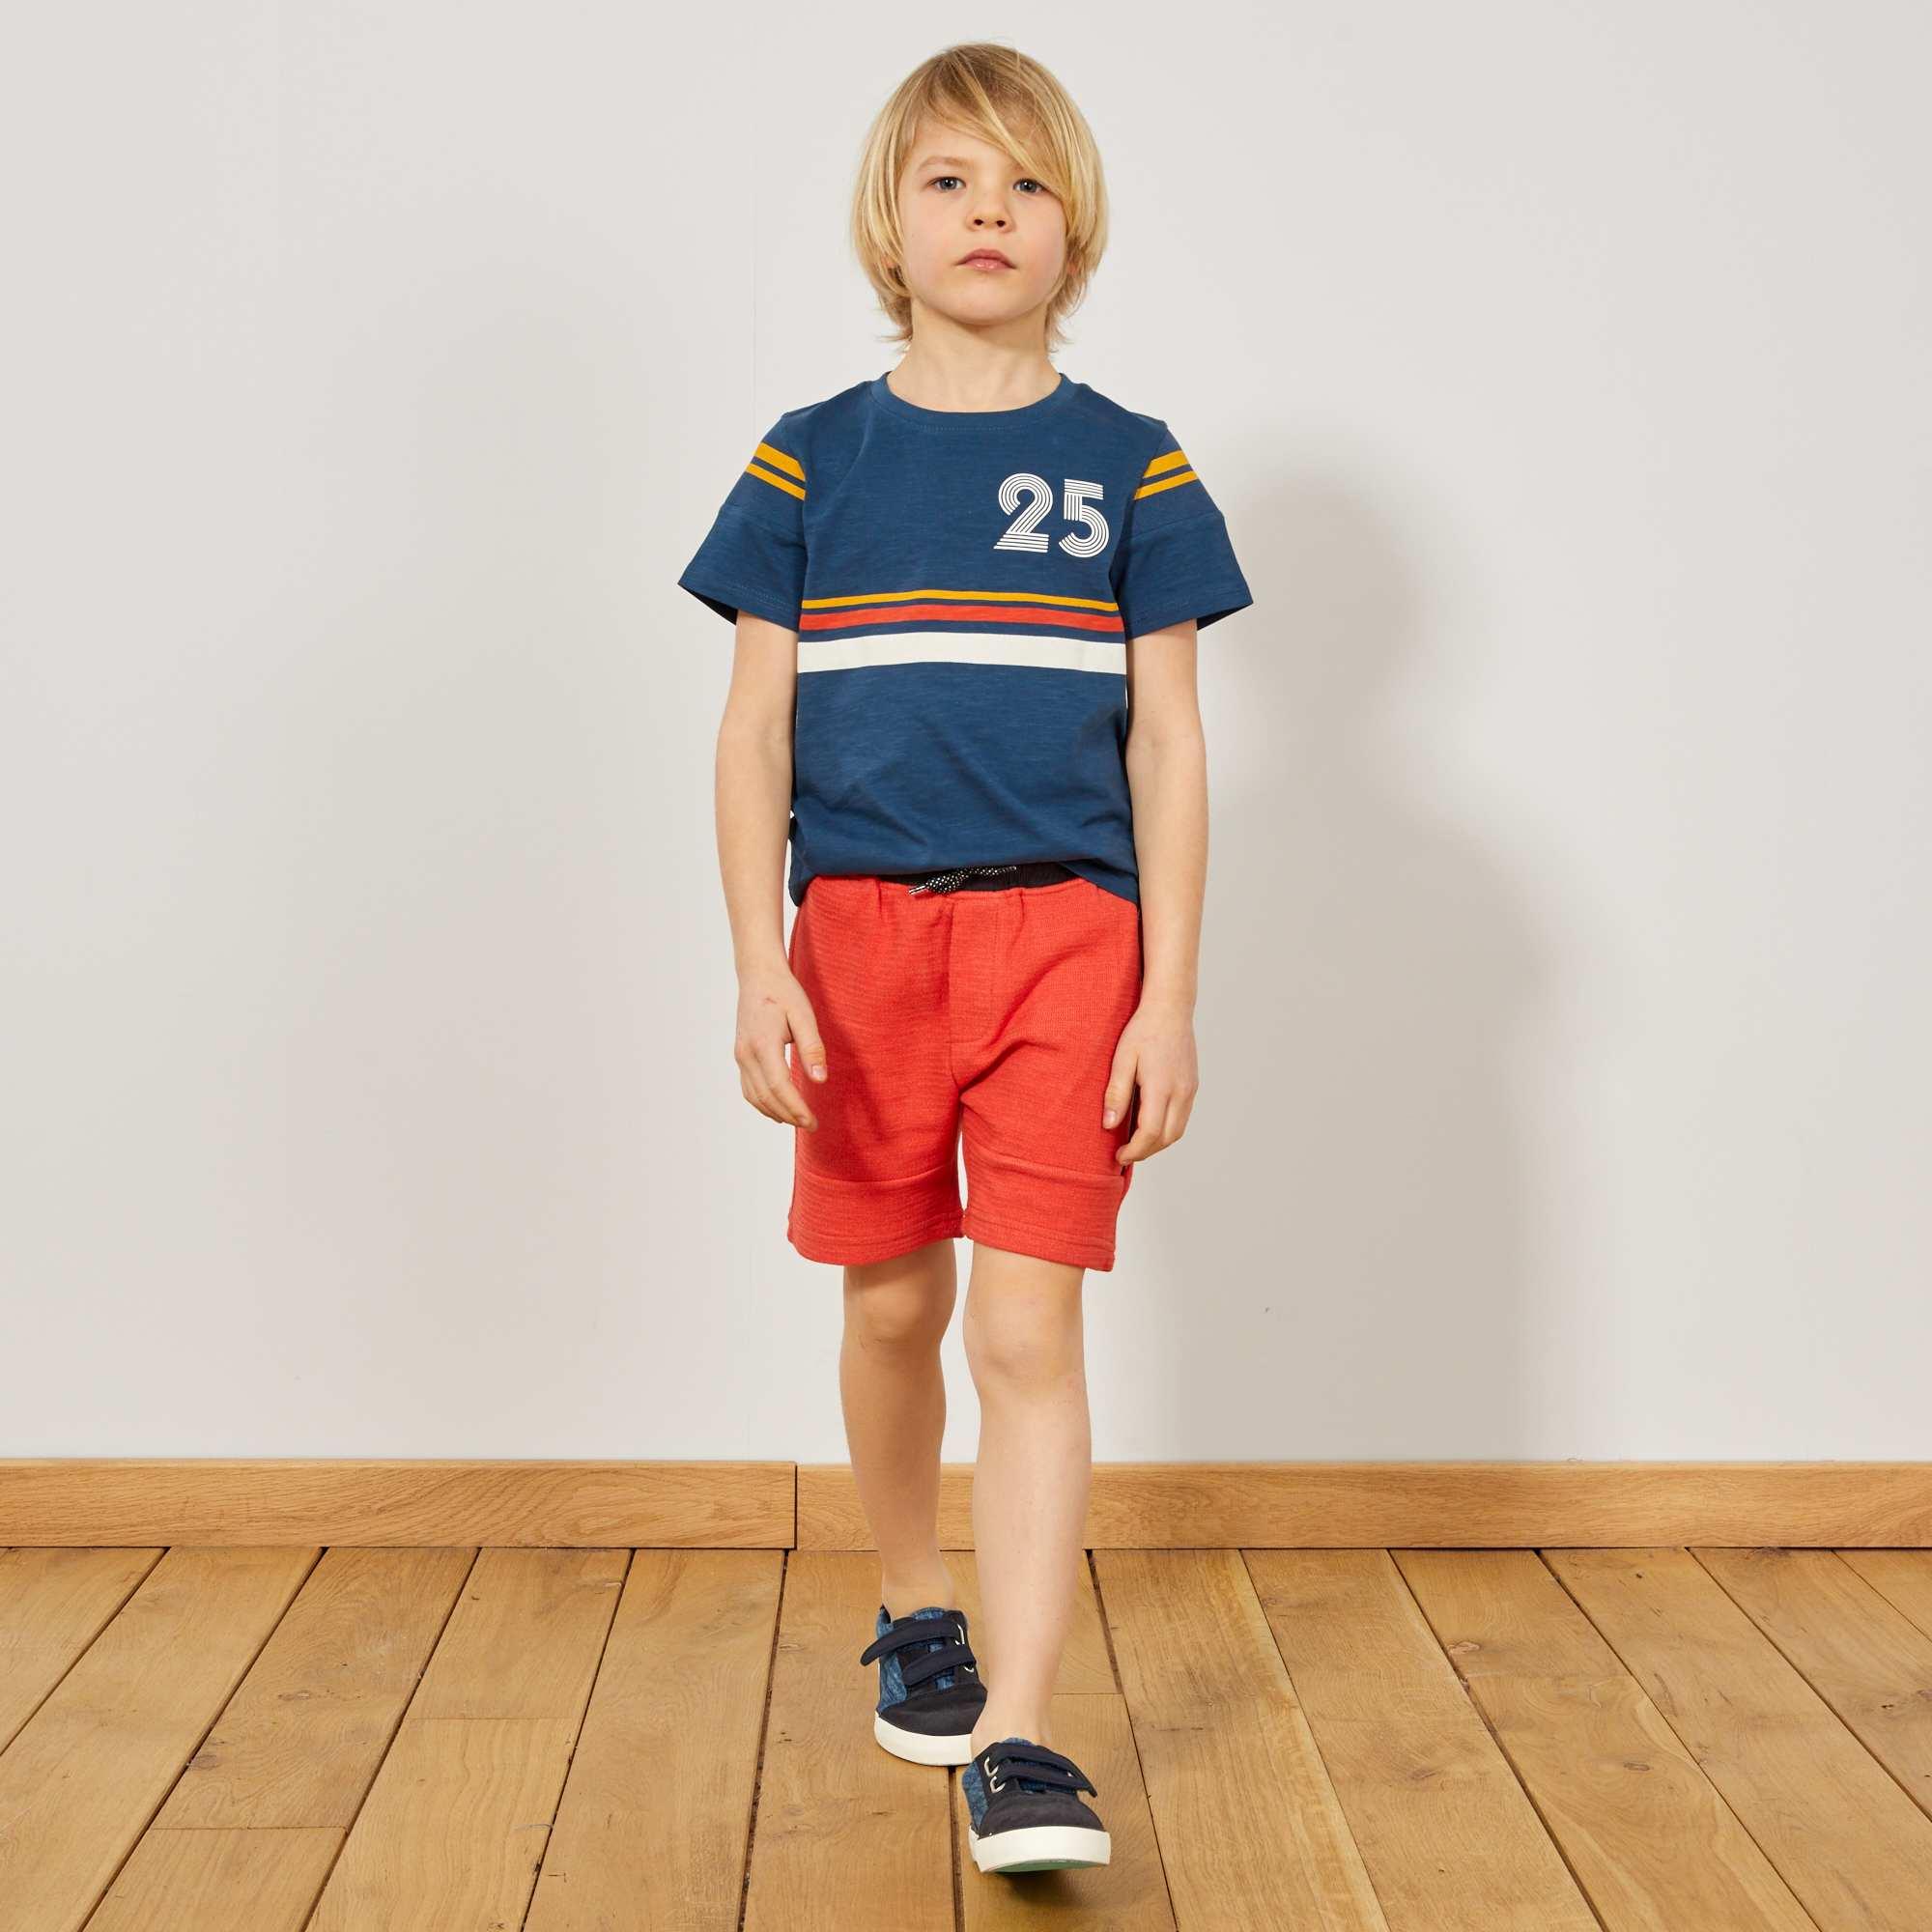 Bermuda maglia fantasia Infanzia bambino - rosso - Kiabi - 9 d9367640eac8